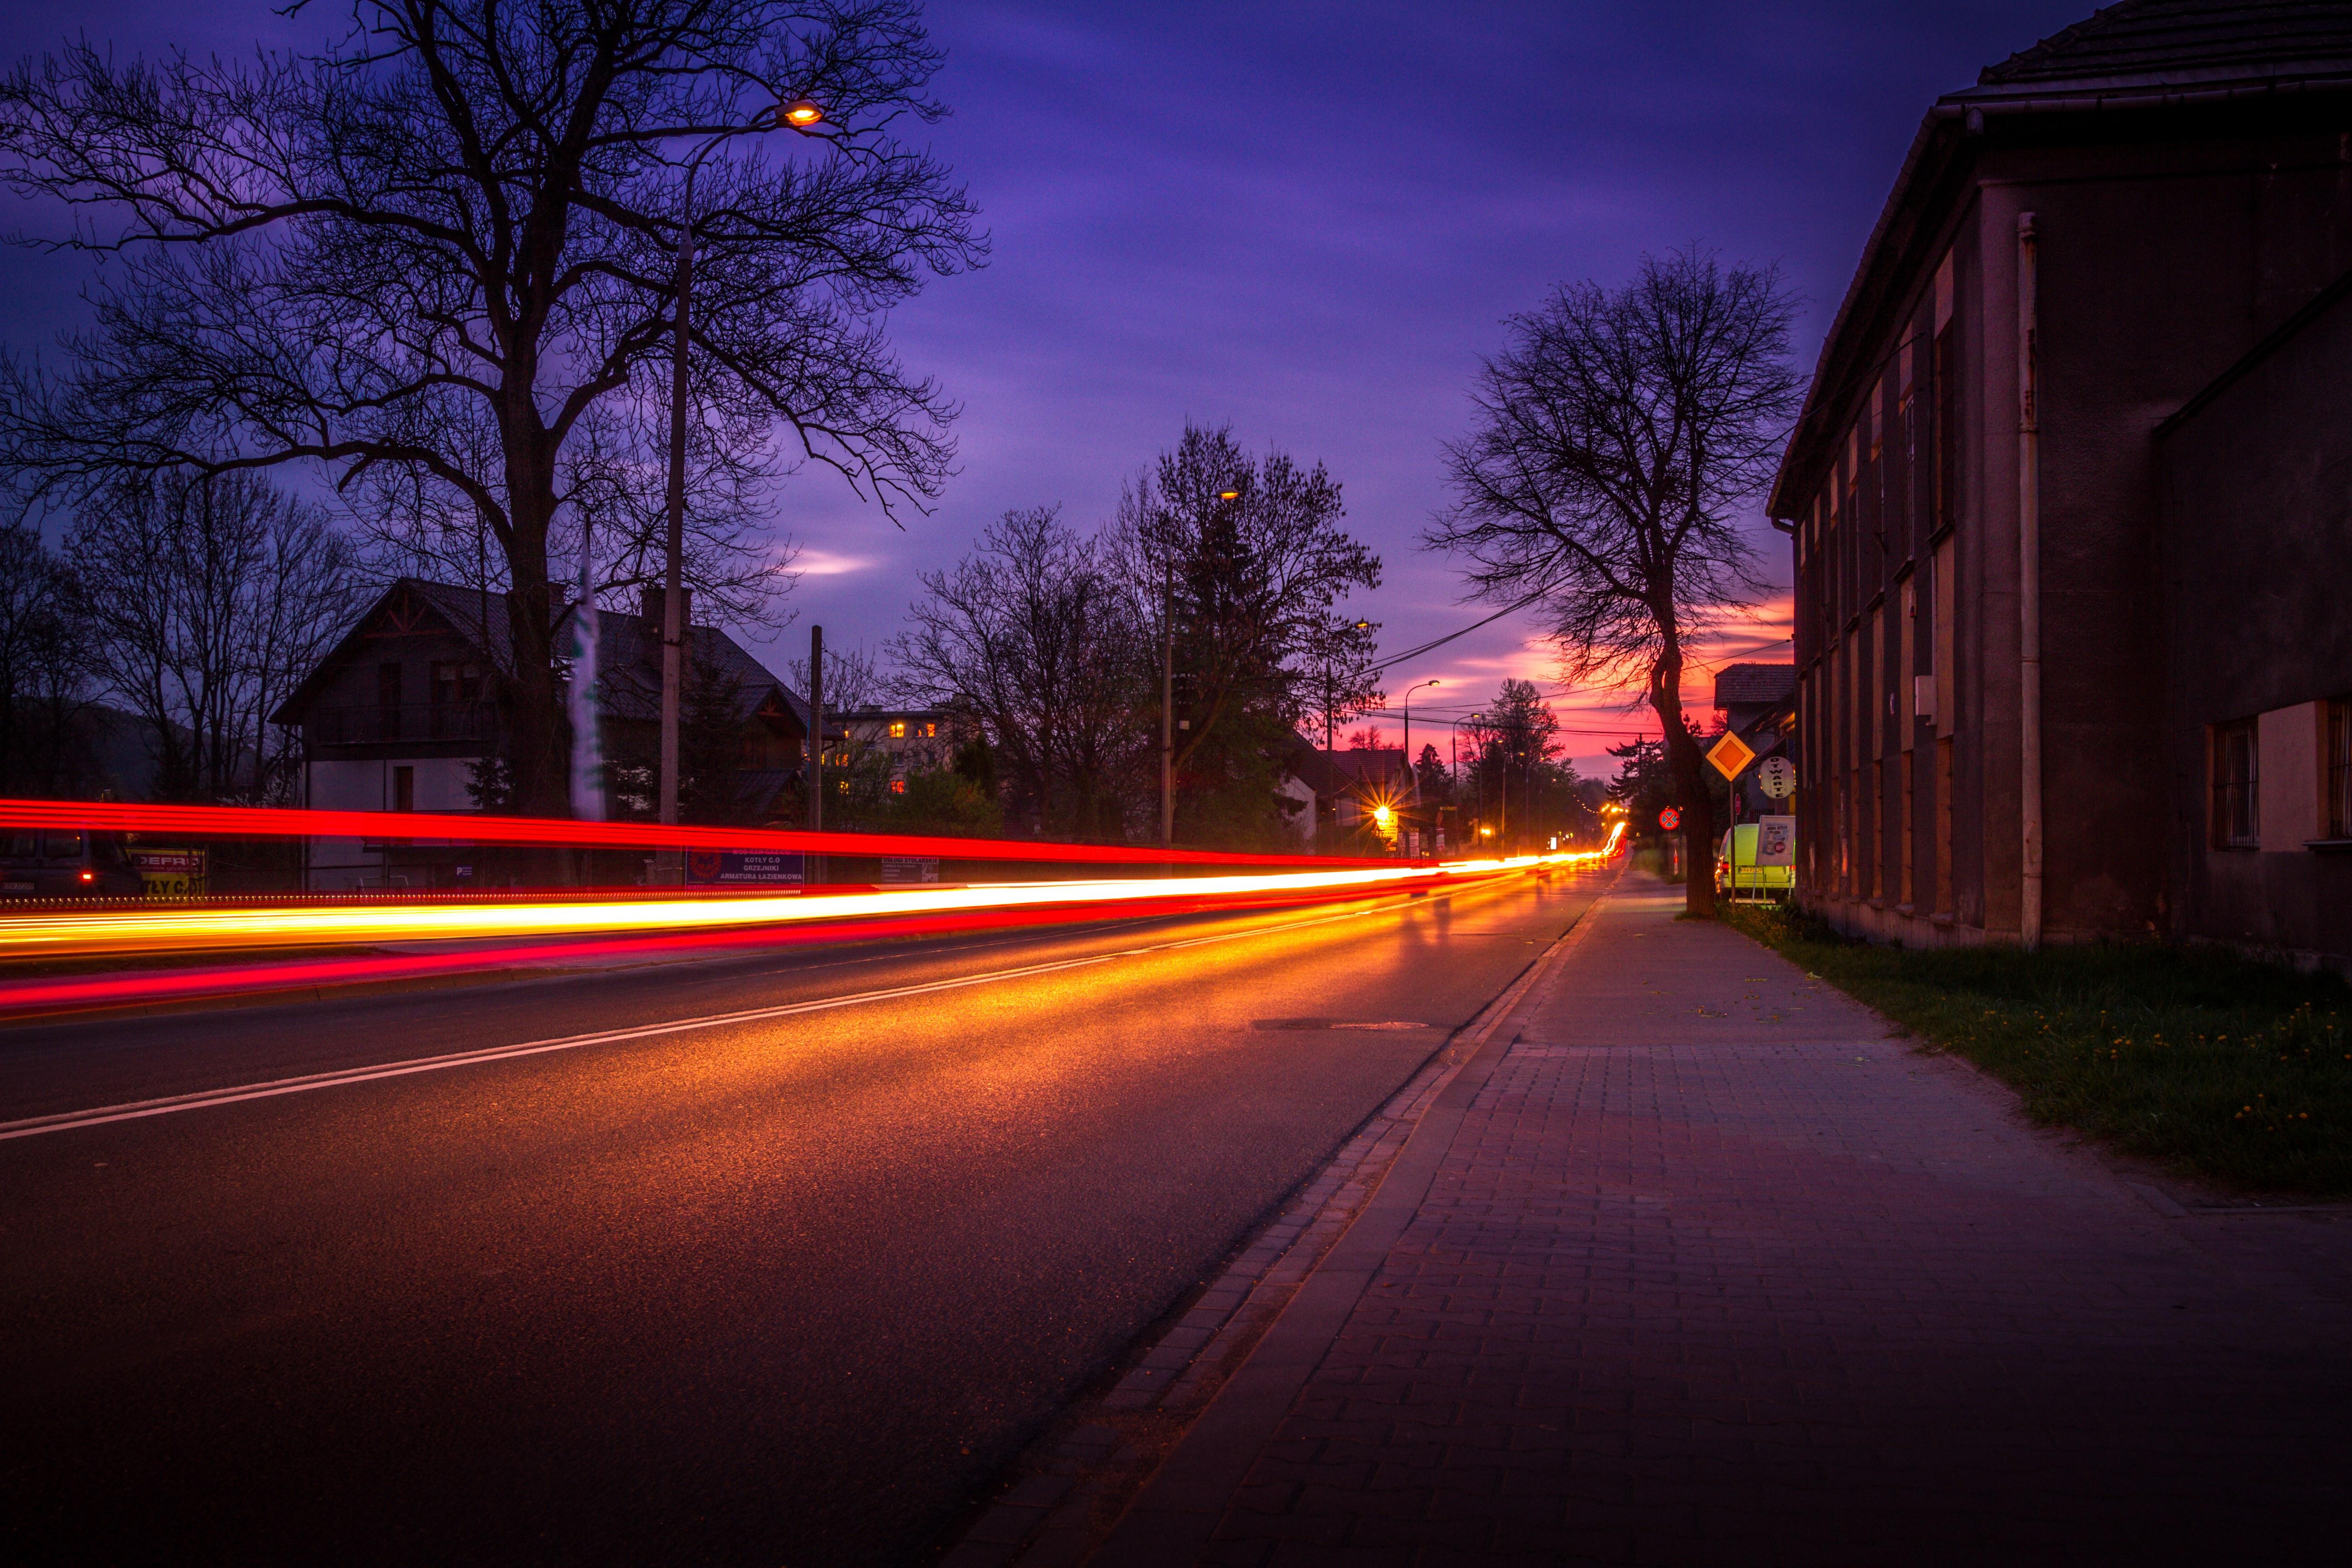 free images sunset road traffic morning